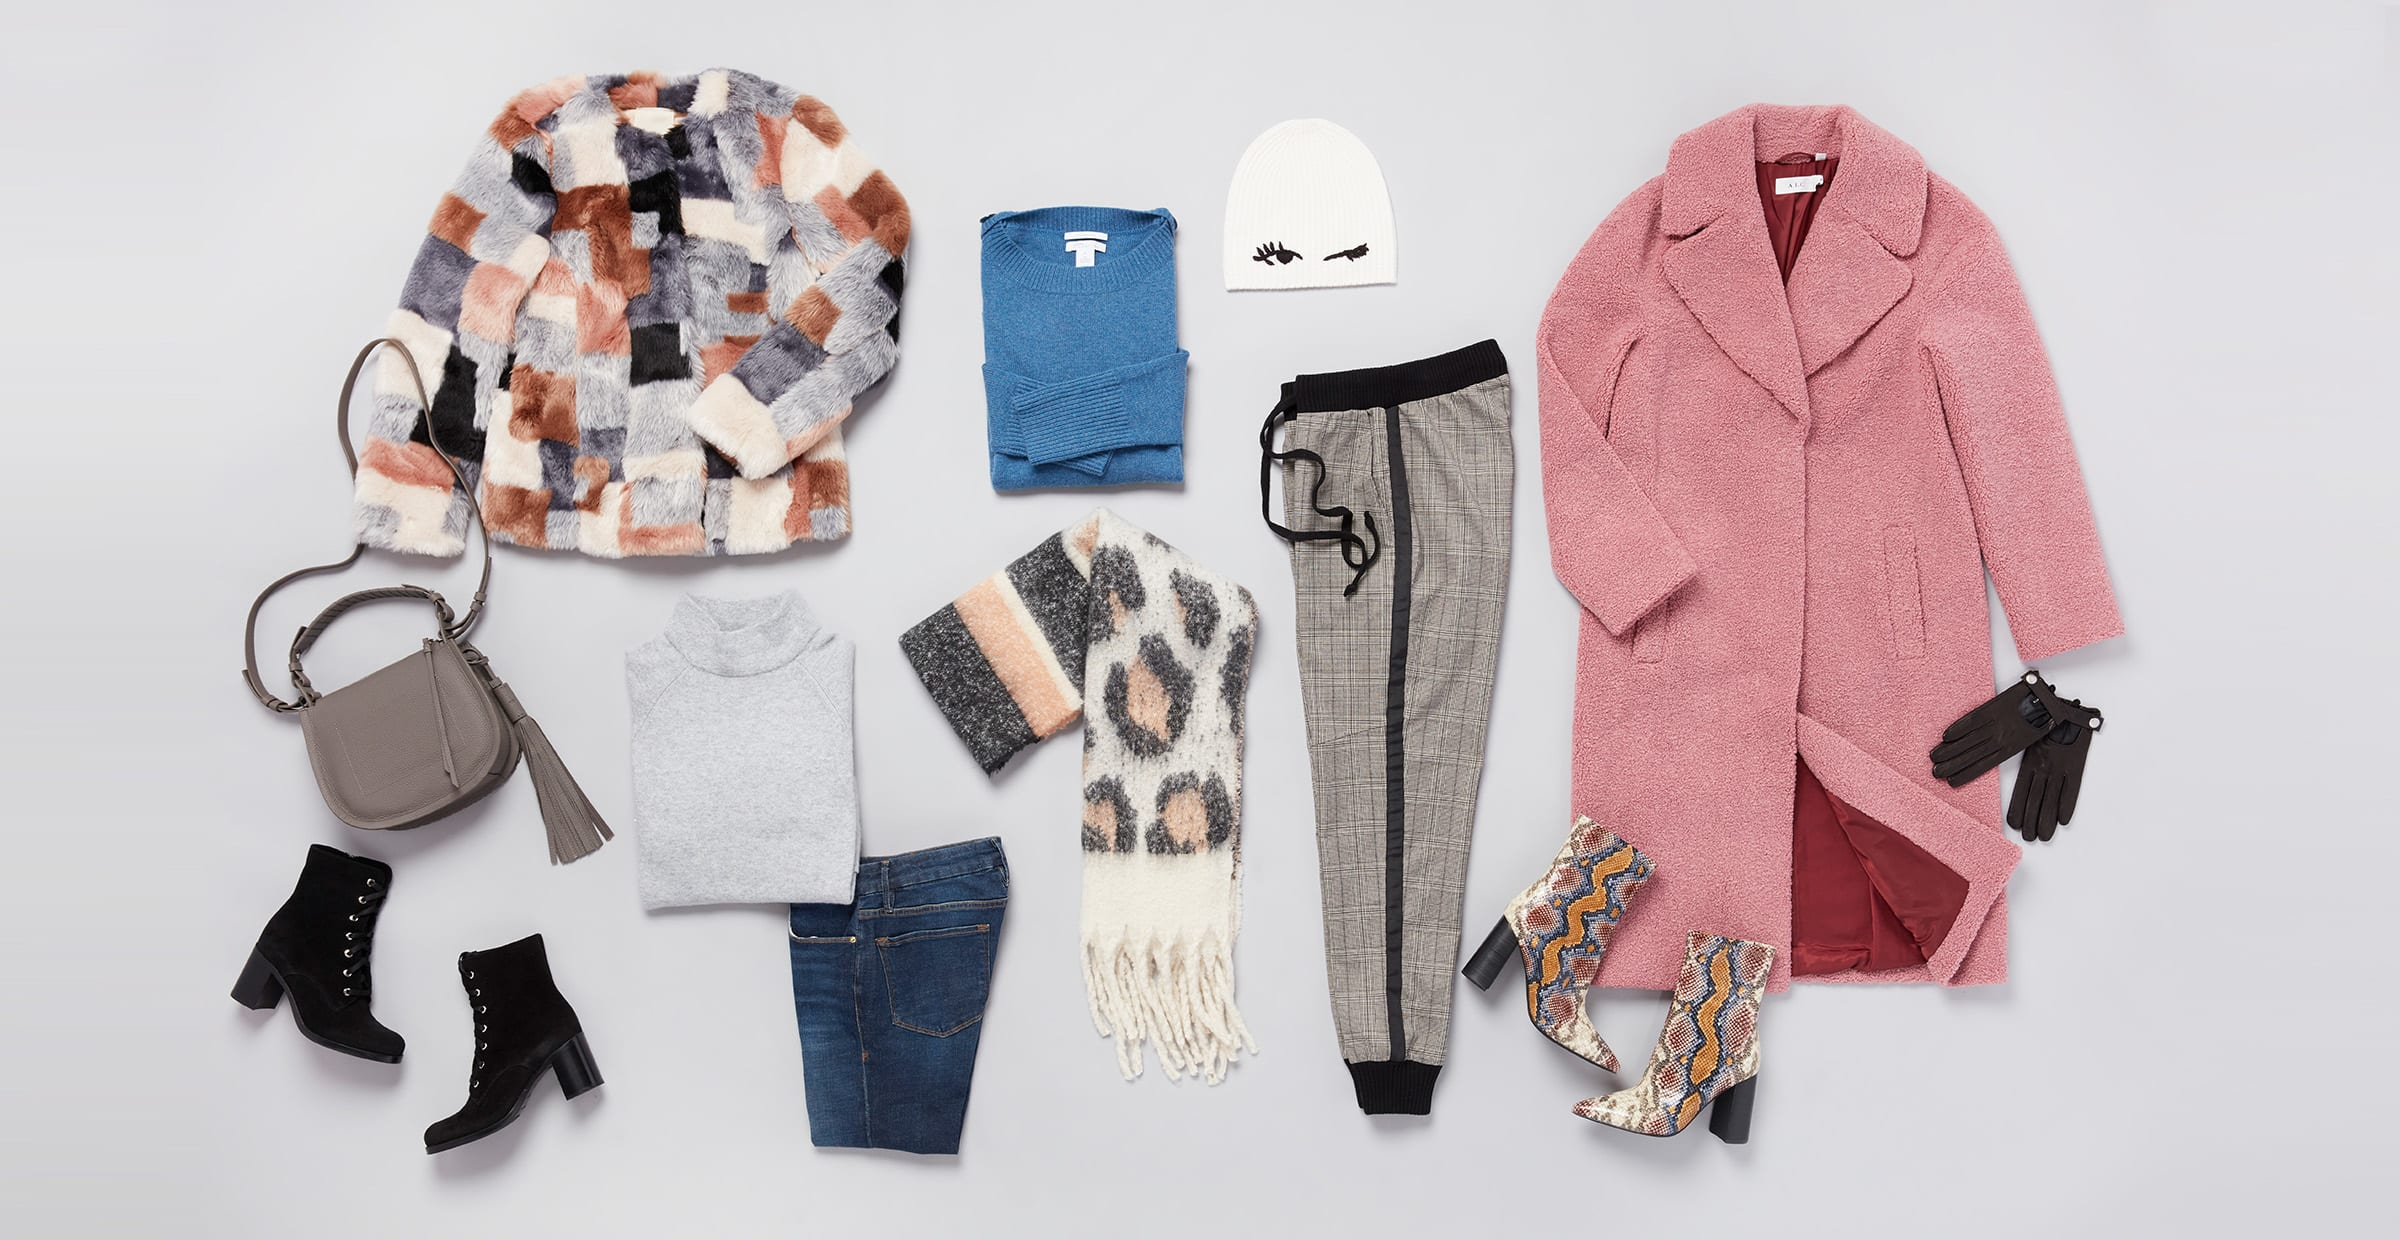 Trendy winter clothing